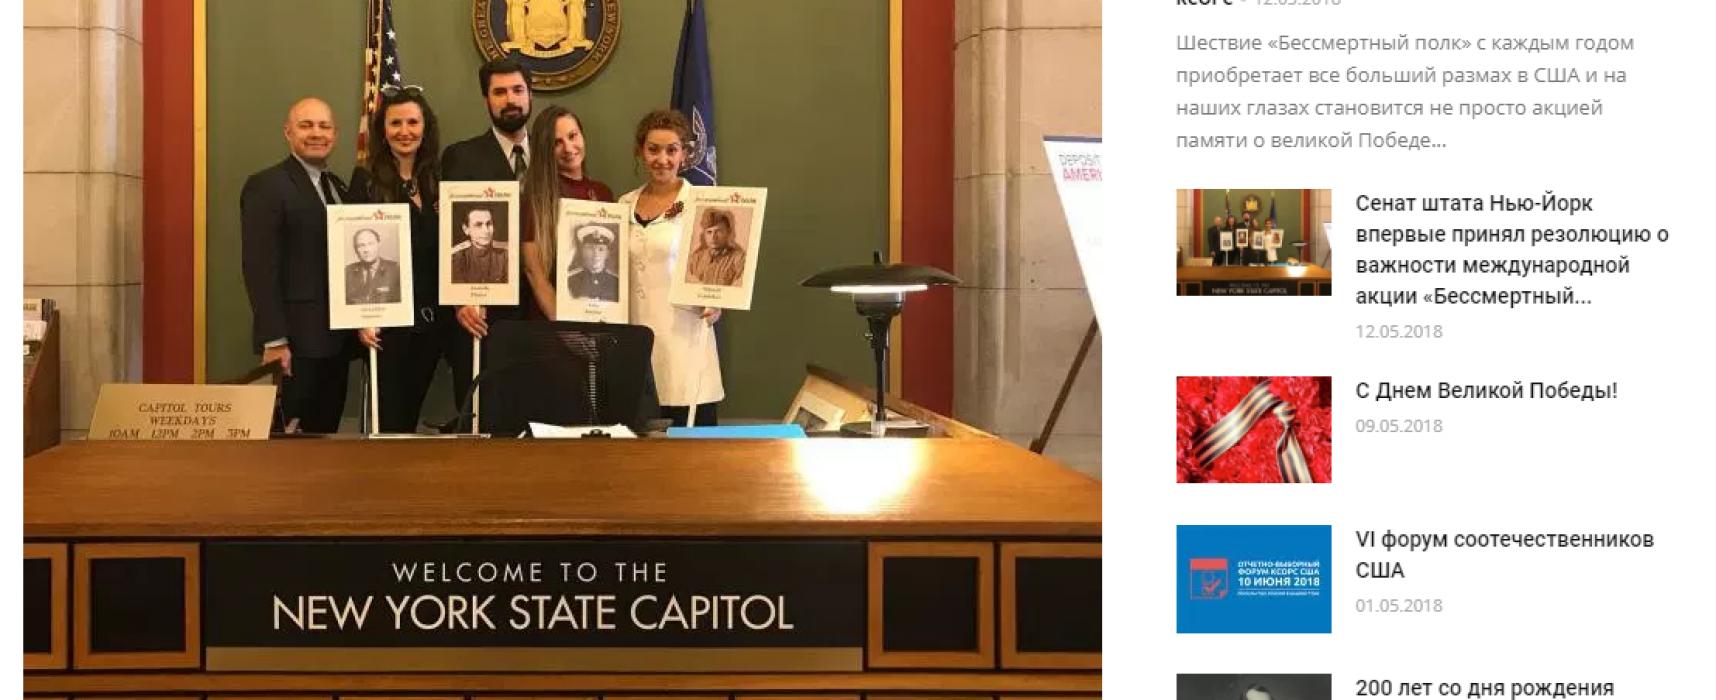 New Yorker Senat begrüßt russische Propagandisten